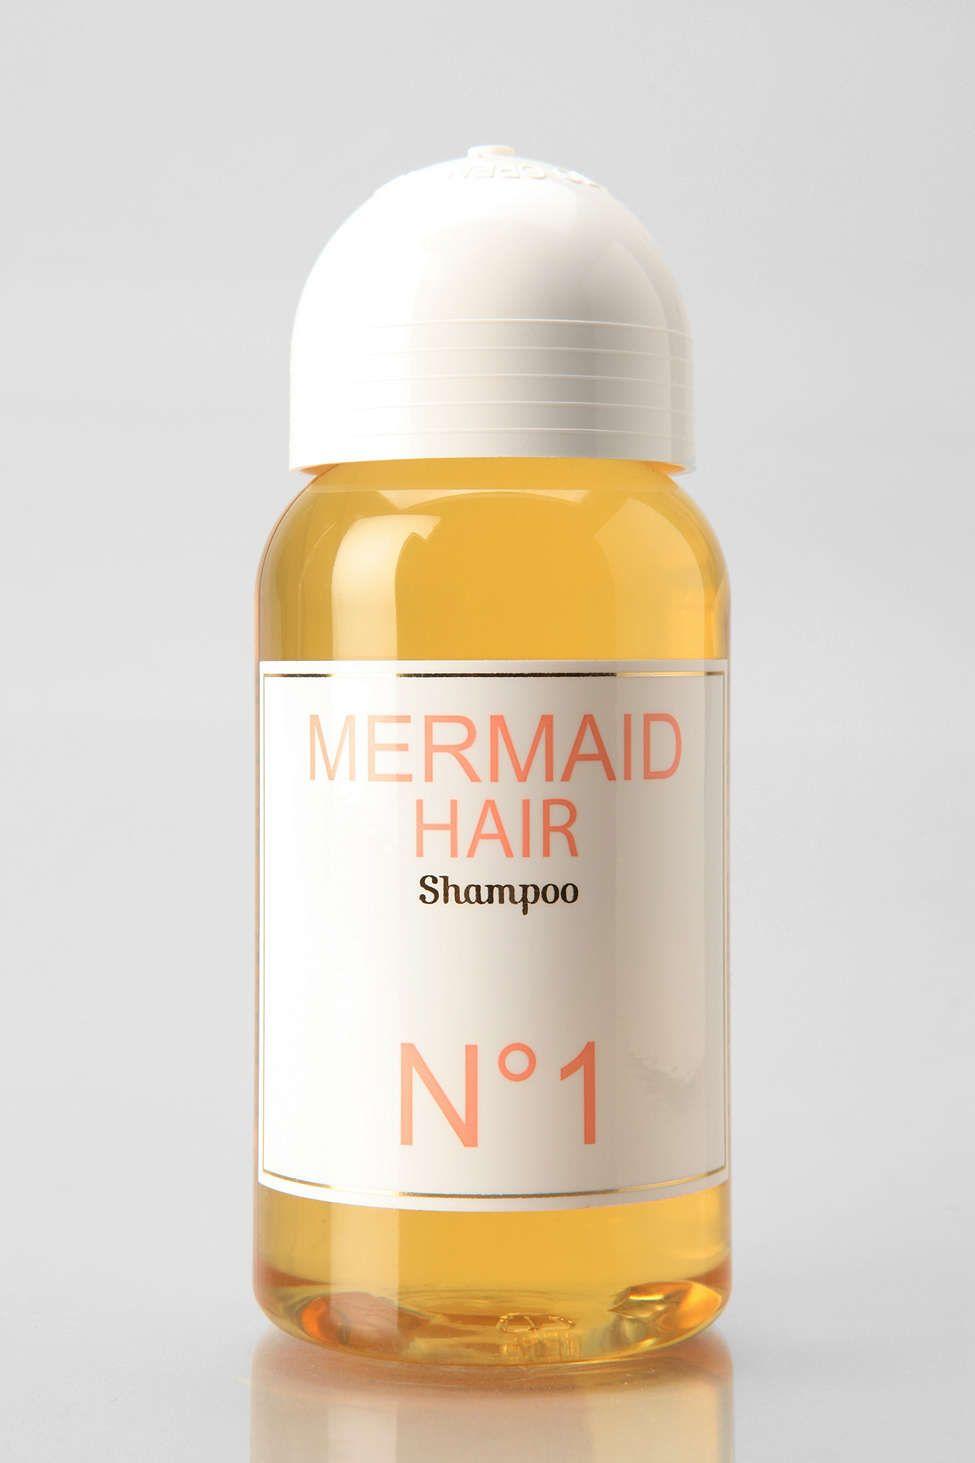 Mermaid Shampoo - Urban Outfitters